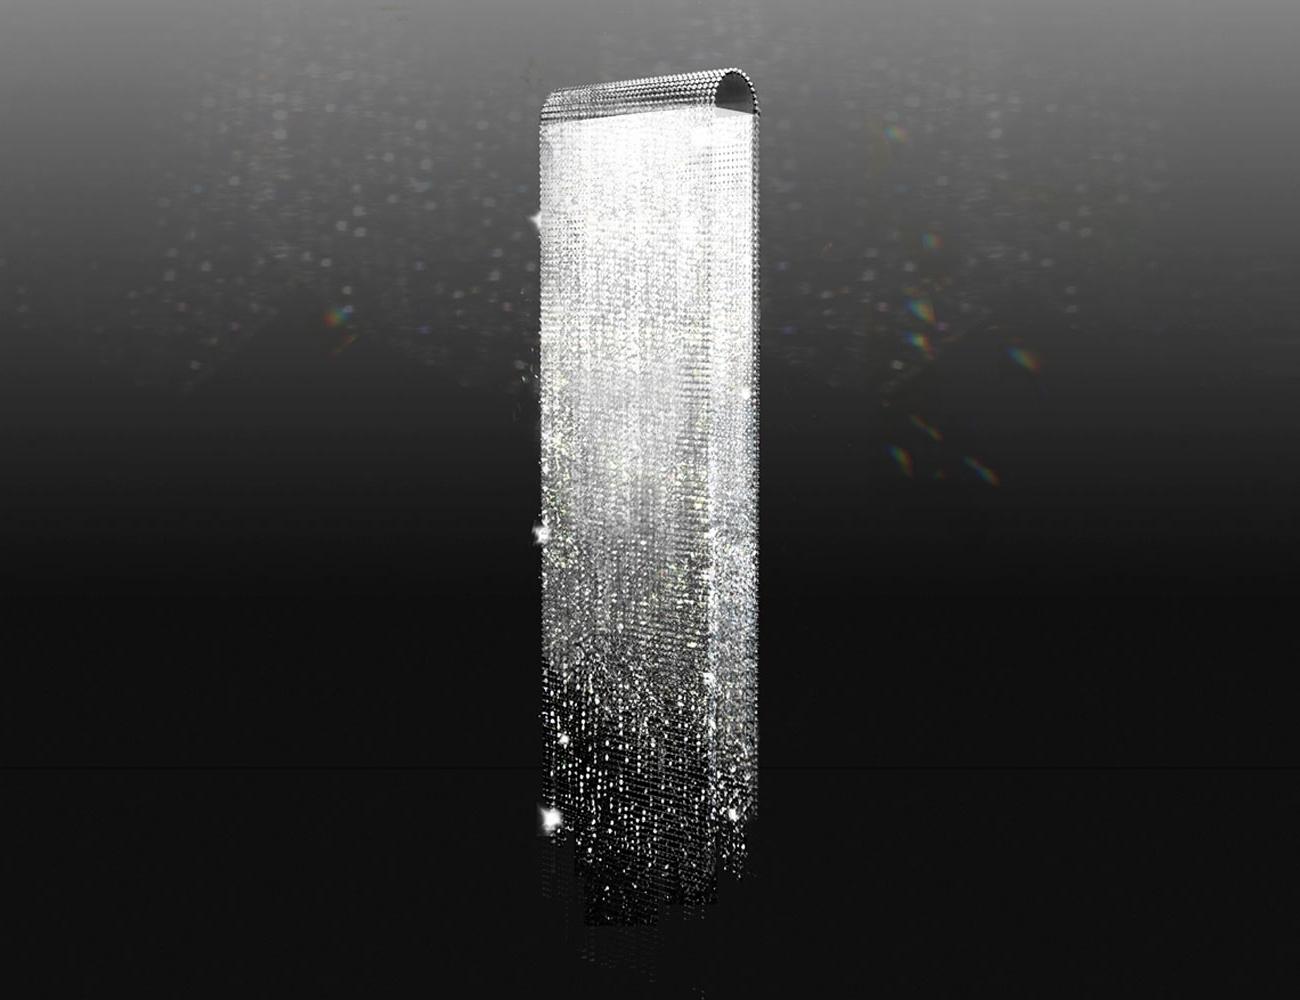 Well Known Chandeliers : Swarovski Crystal Waterfallandelier Light Inrome Round Inside Waterfall Crystal Chandelier (View 7 of 15)